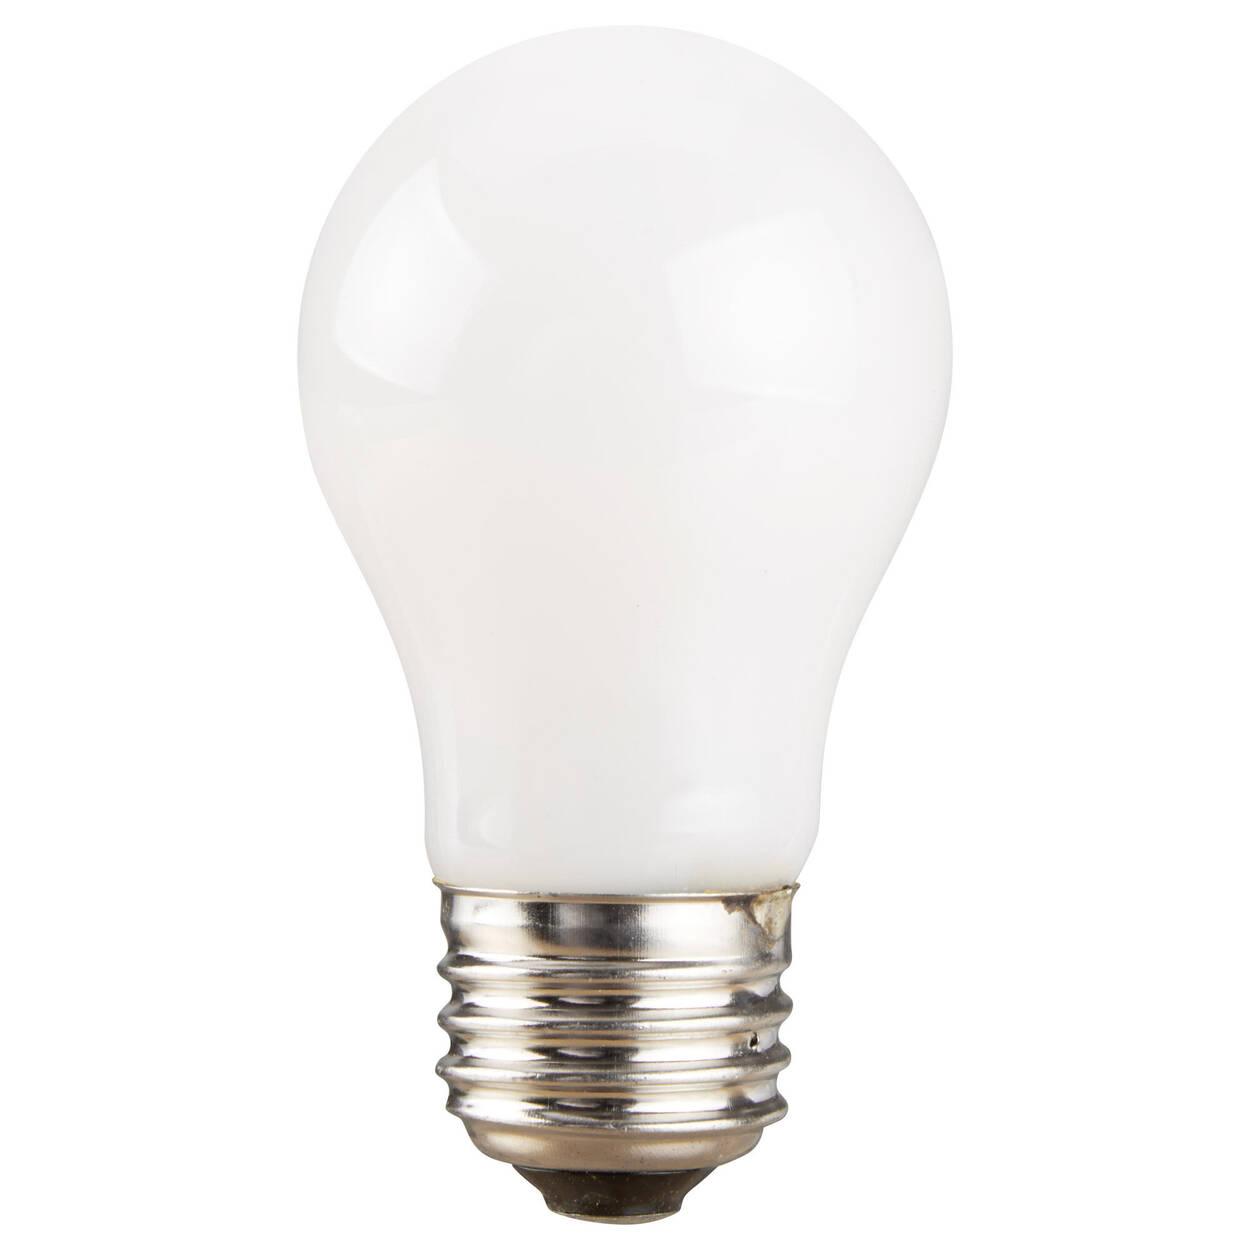 Set of Two Halogen Light Bulbs - 29W